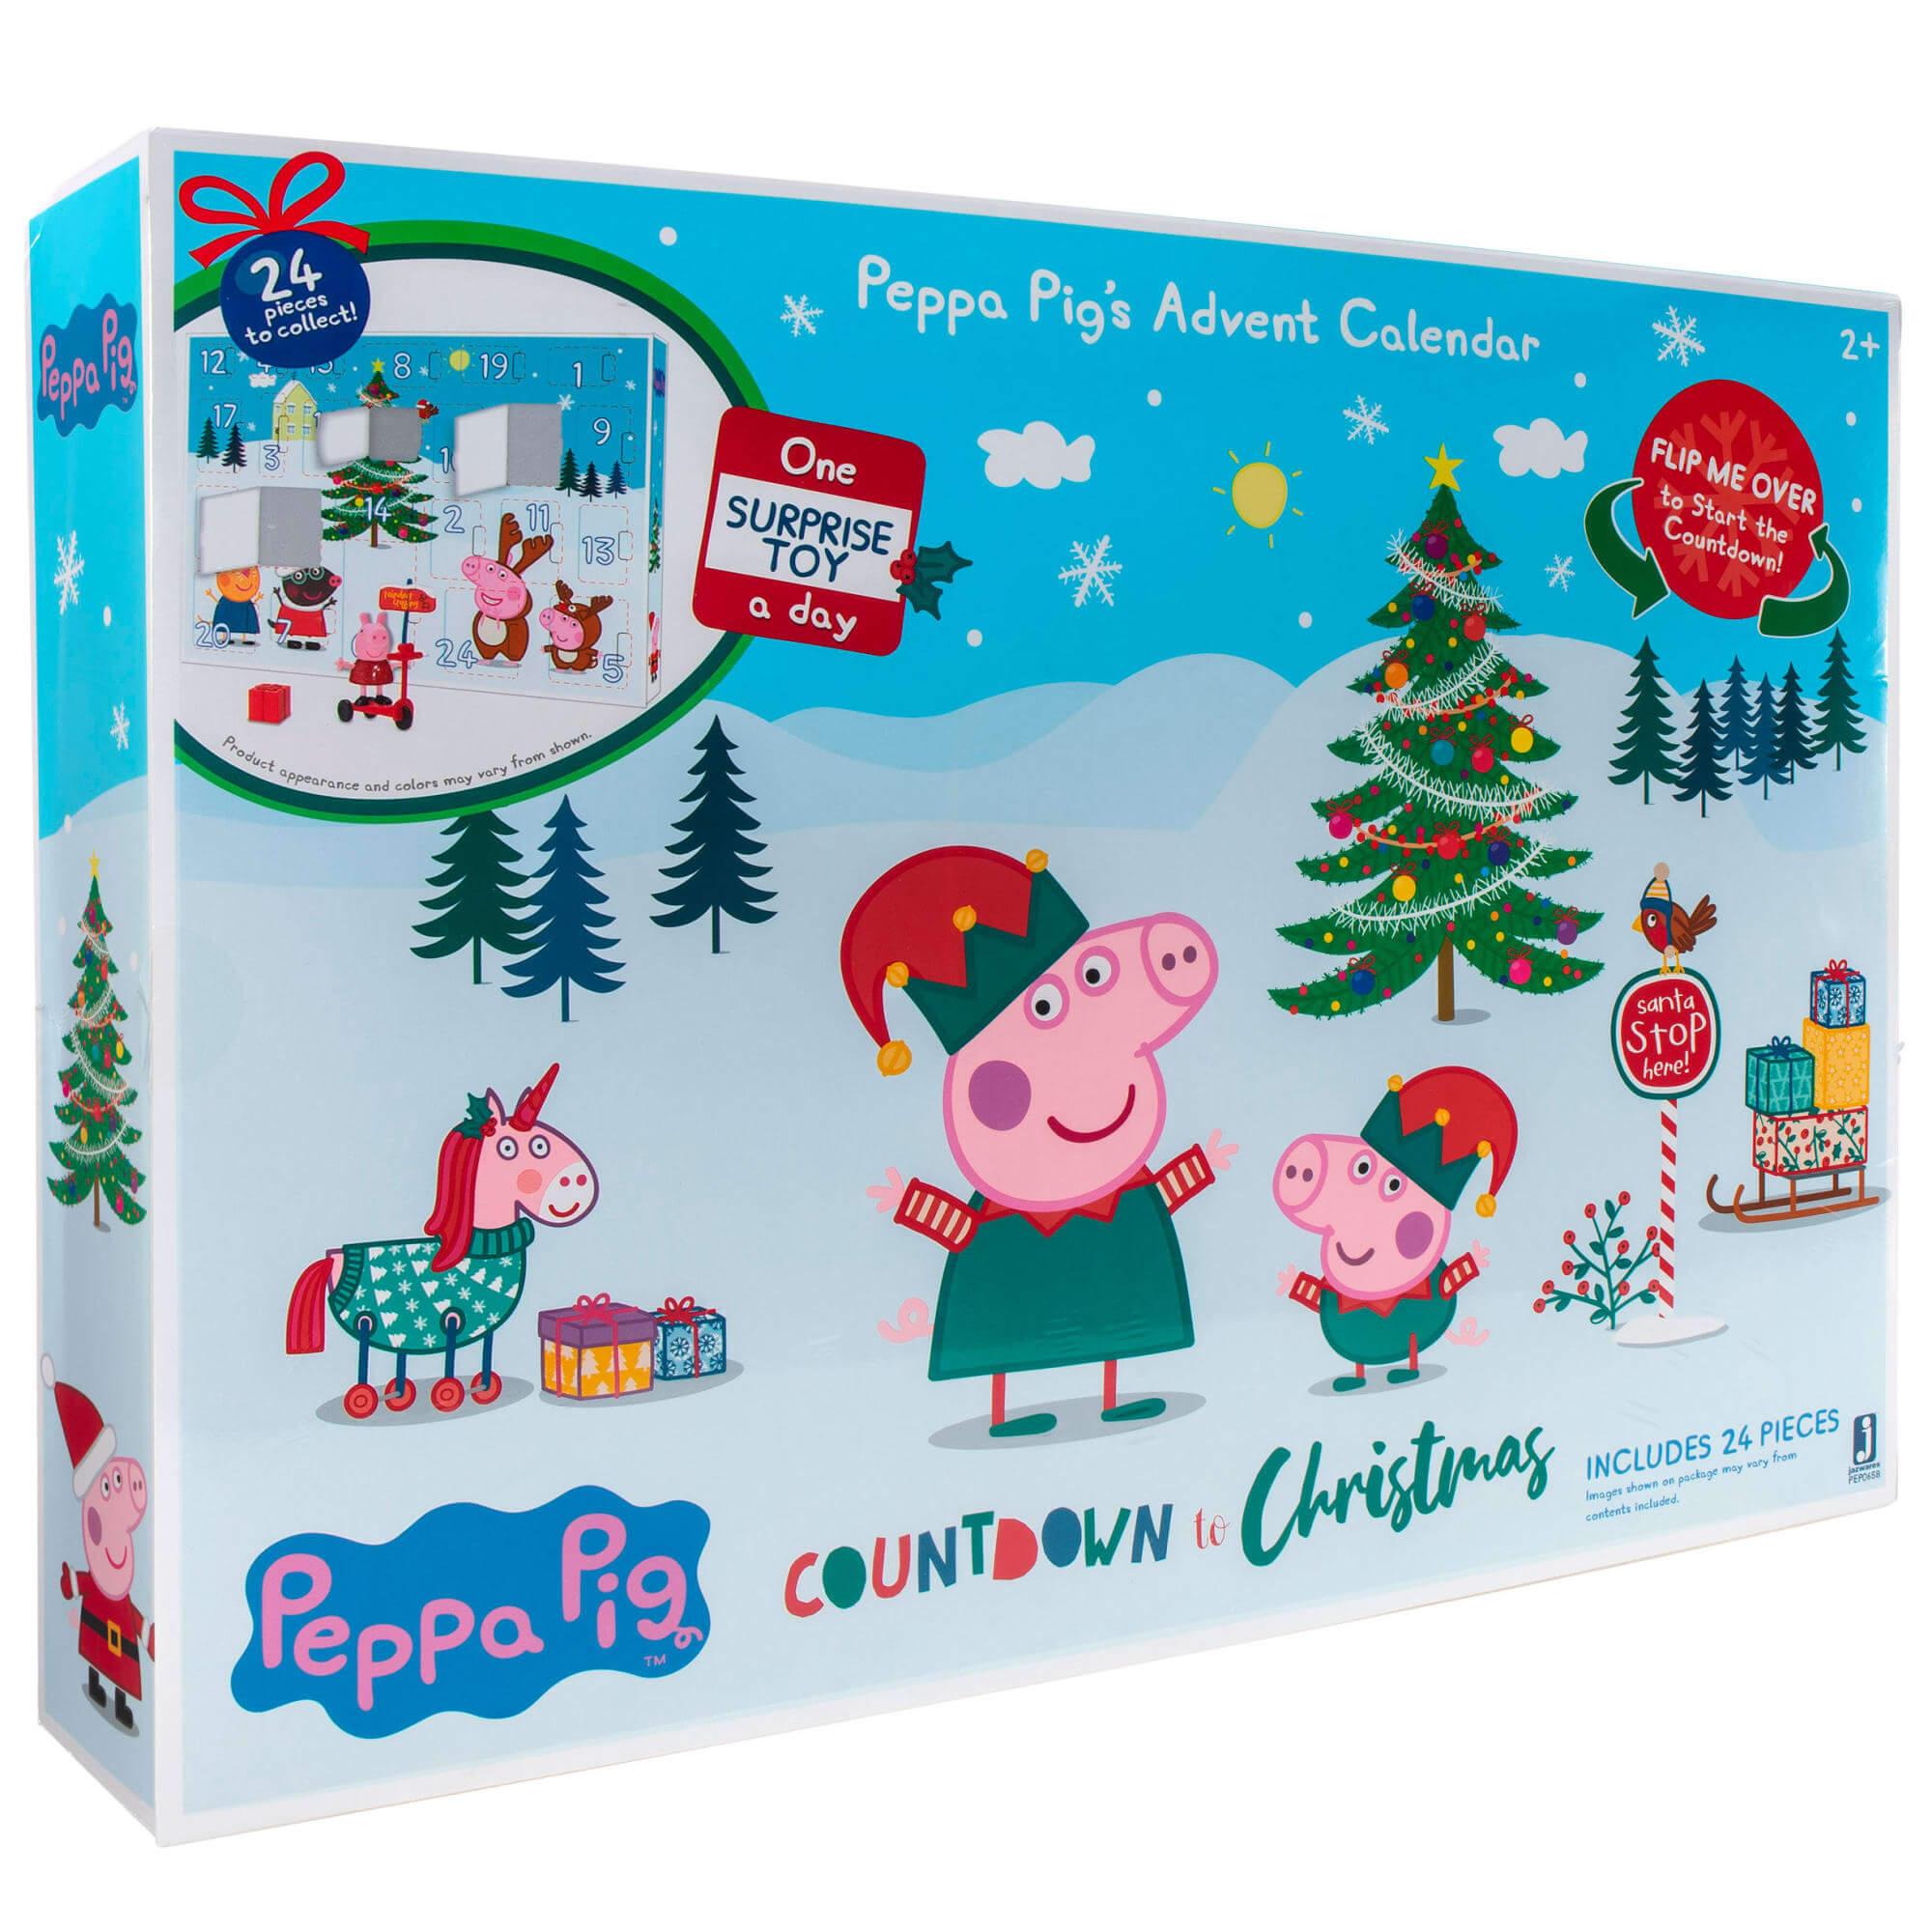 gurli-gris-julekalender-2020